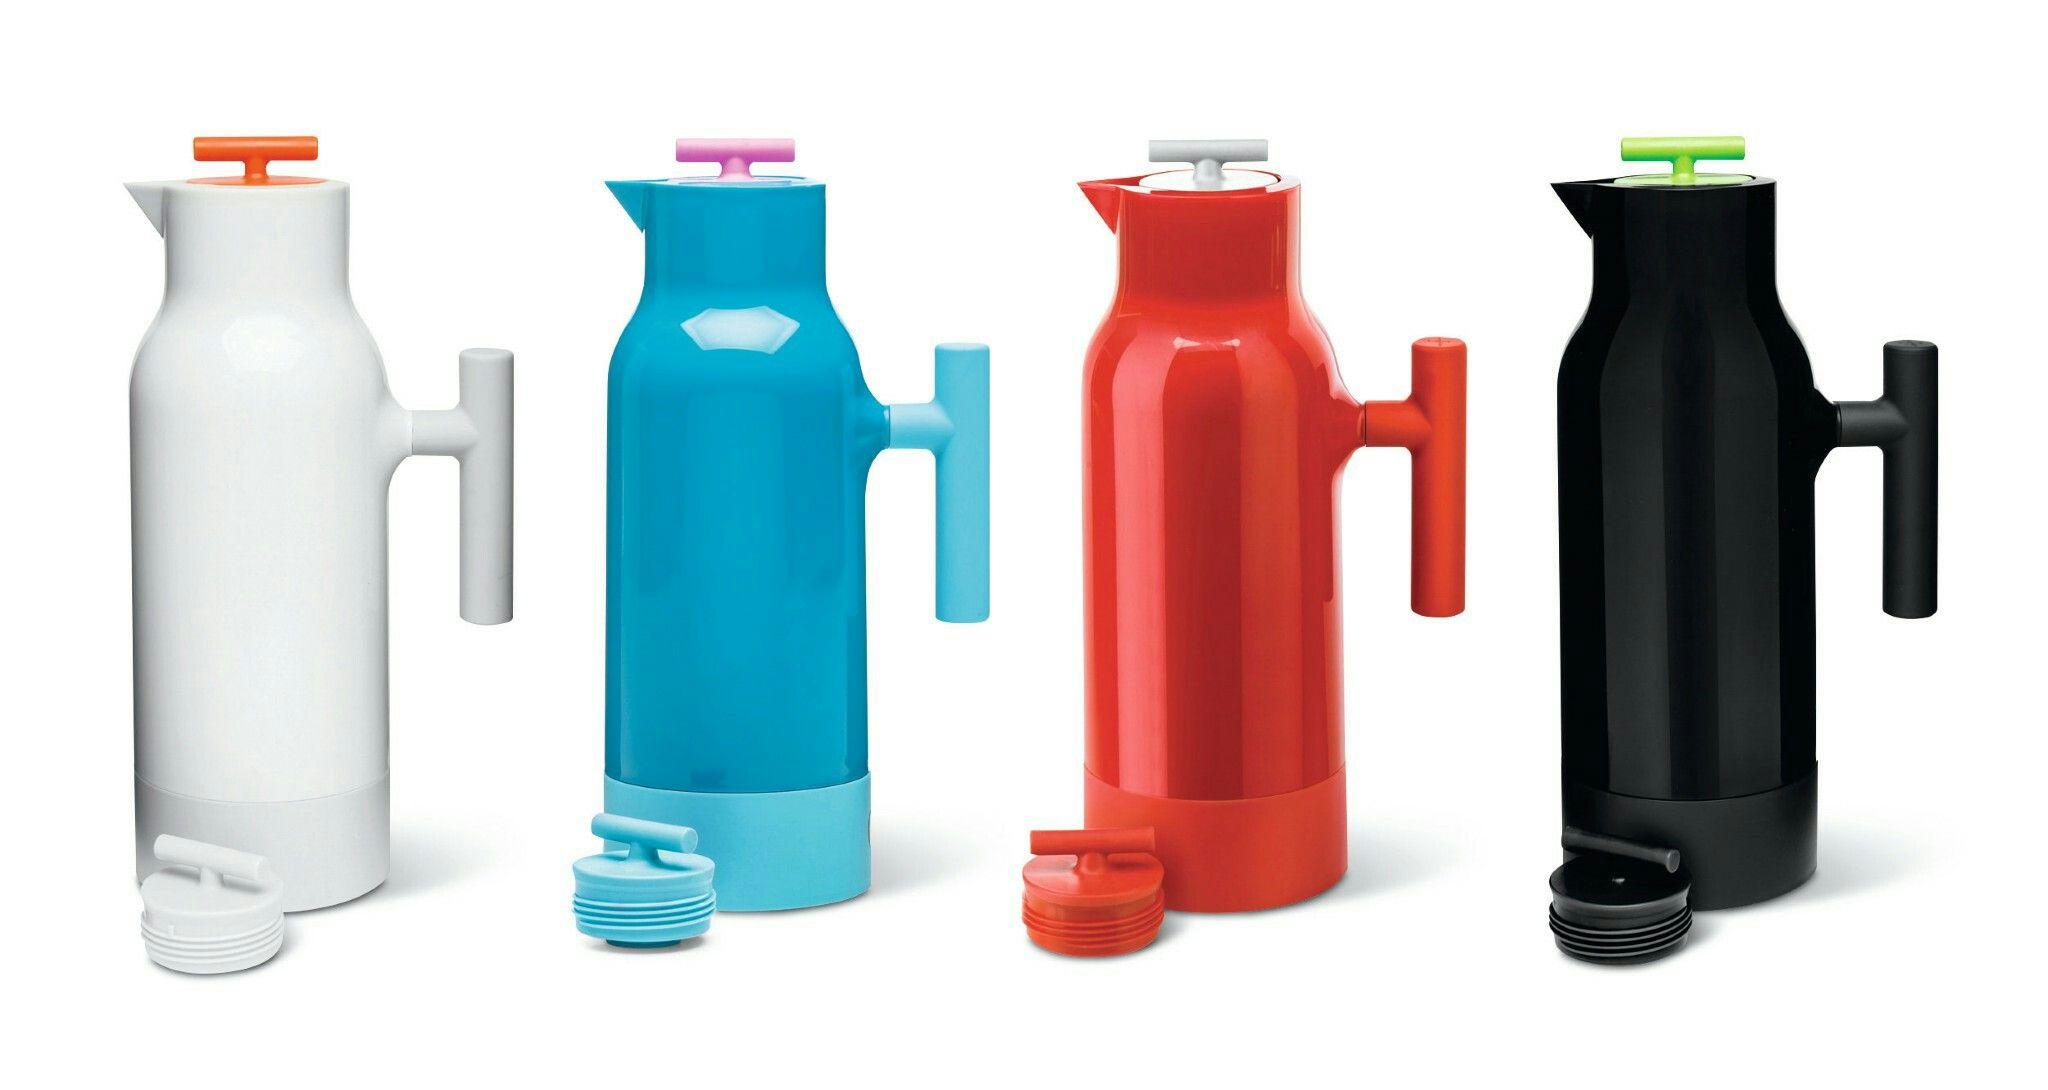 Accent Vacuum Flask Manufacturer Sagaform AB, Borås, Sweden www ...